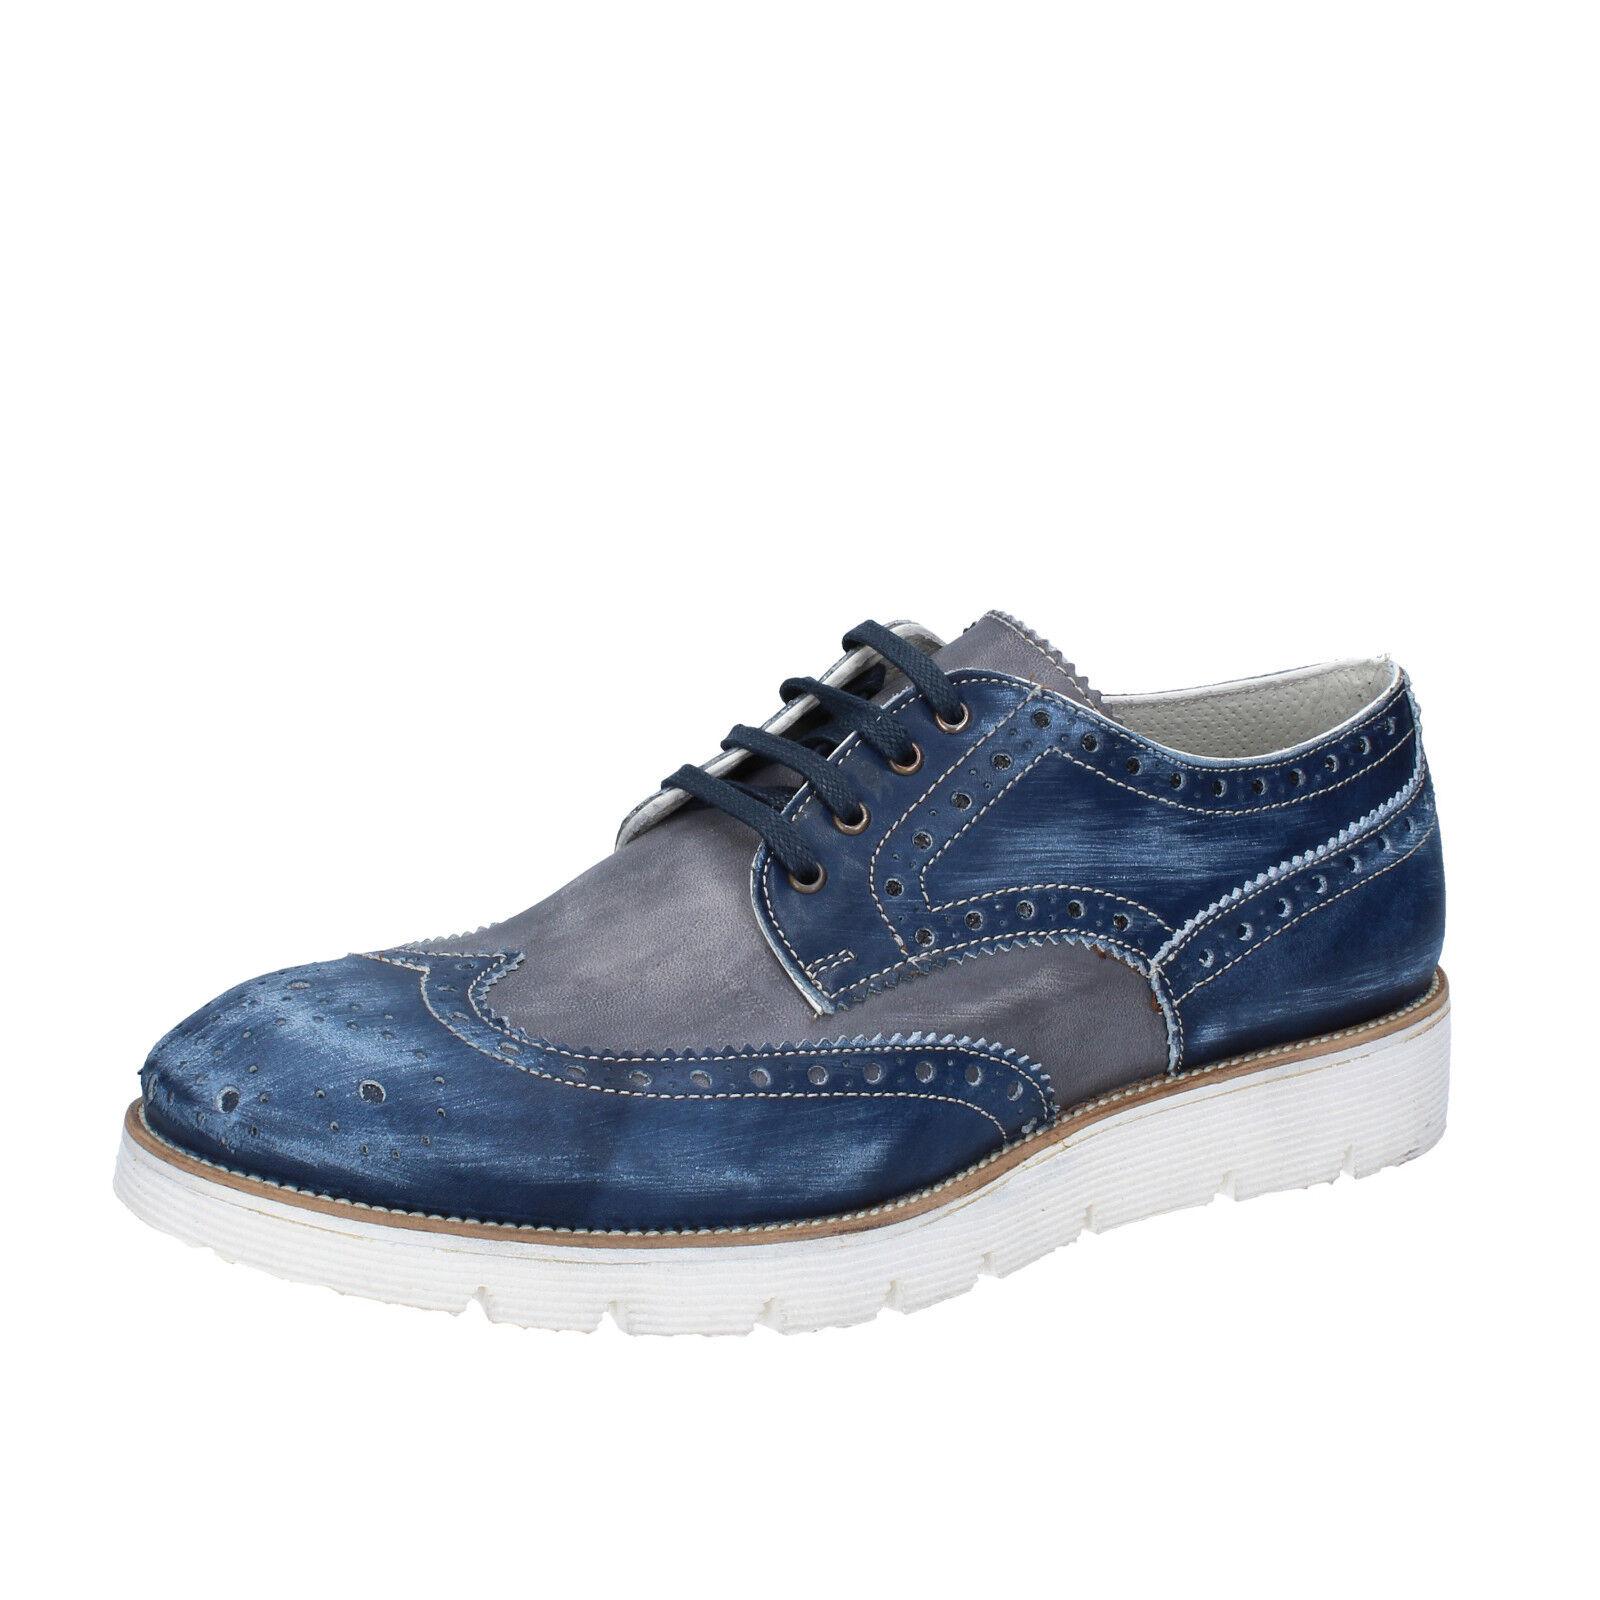 Herren schuhe +2 MADE IN ITALY 40 elegante blau grau leder BZ455-B